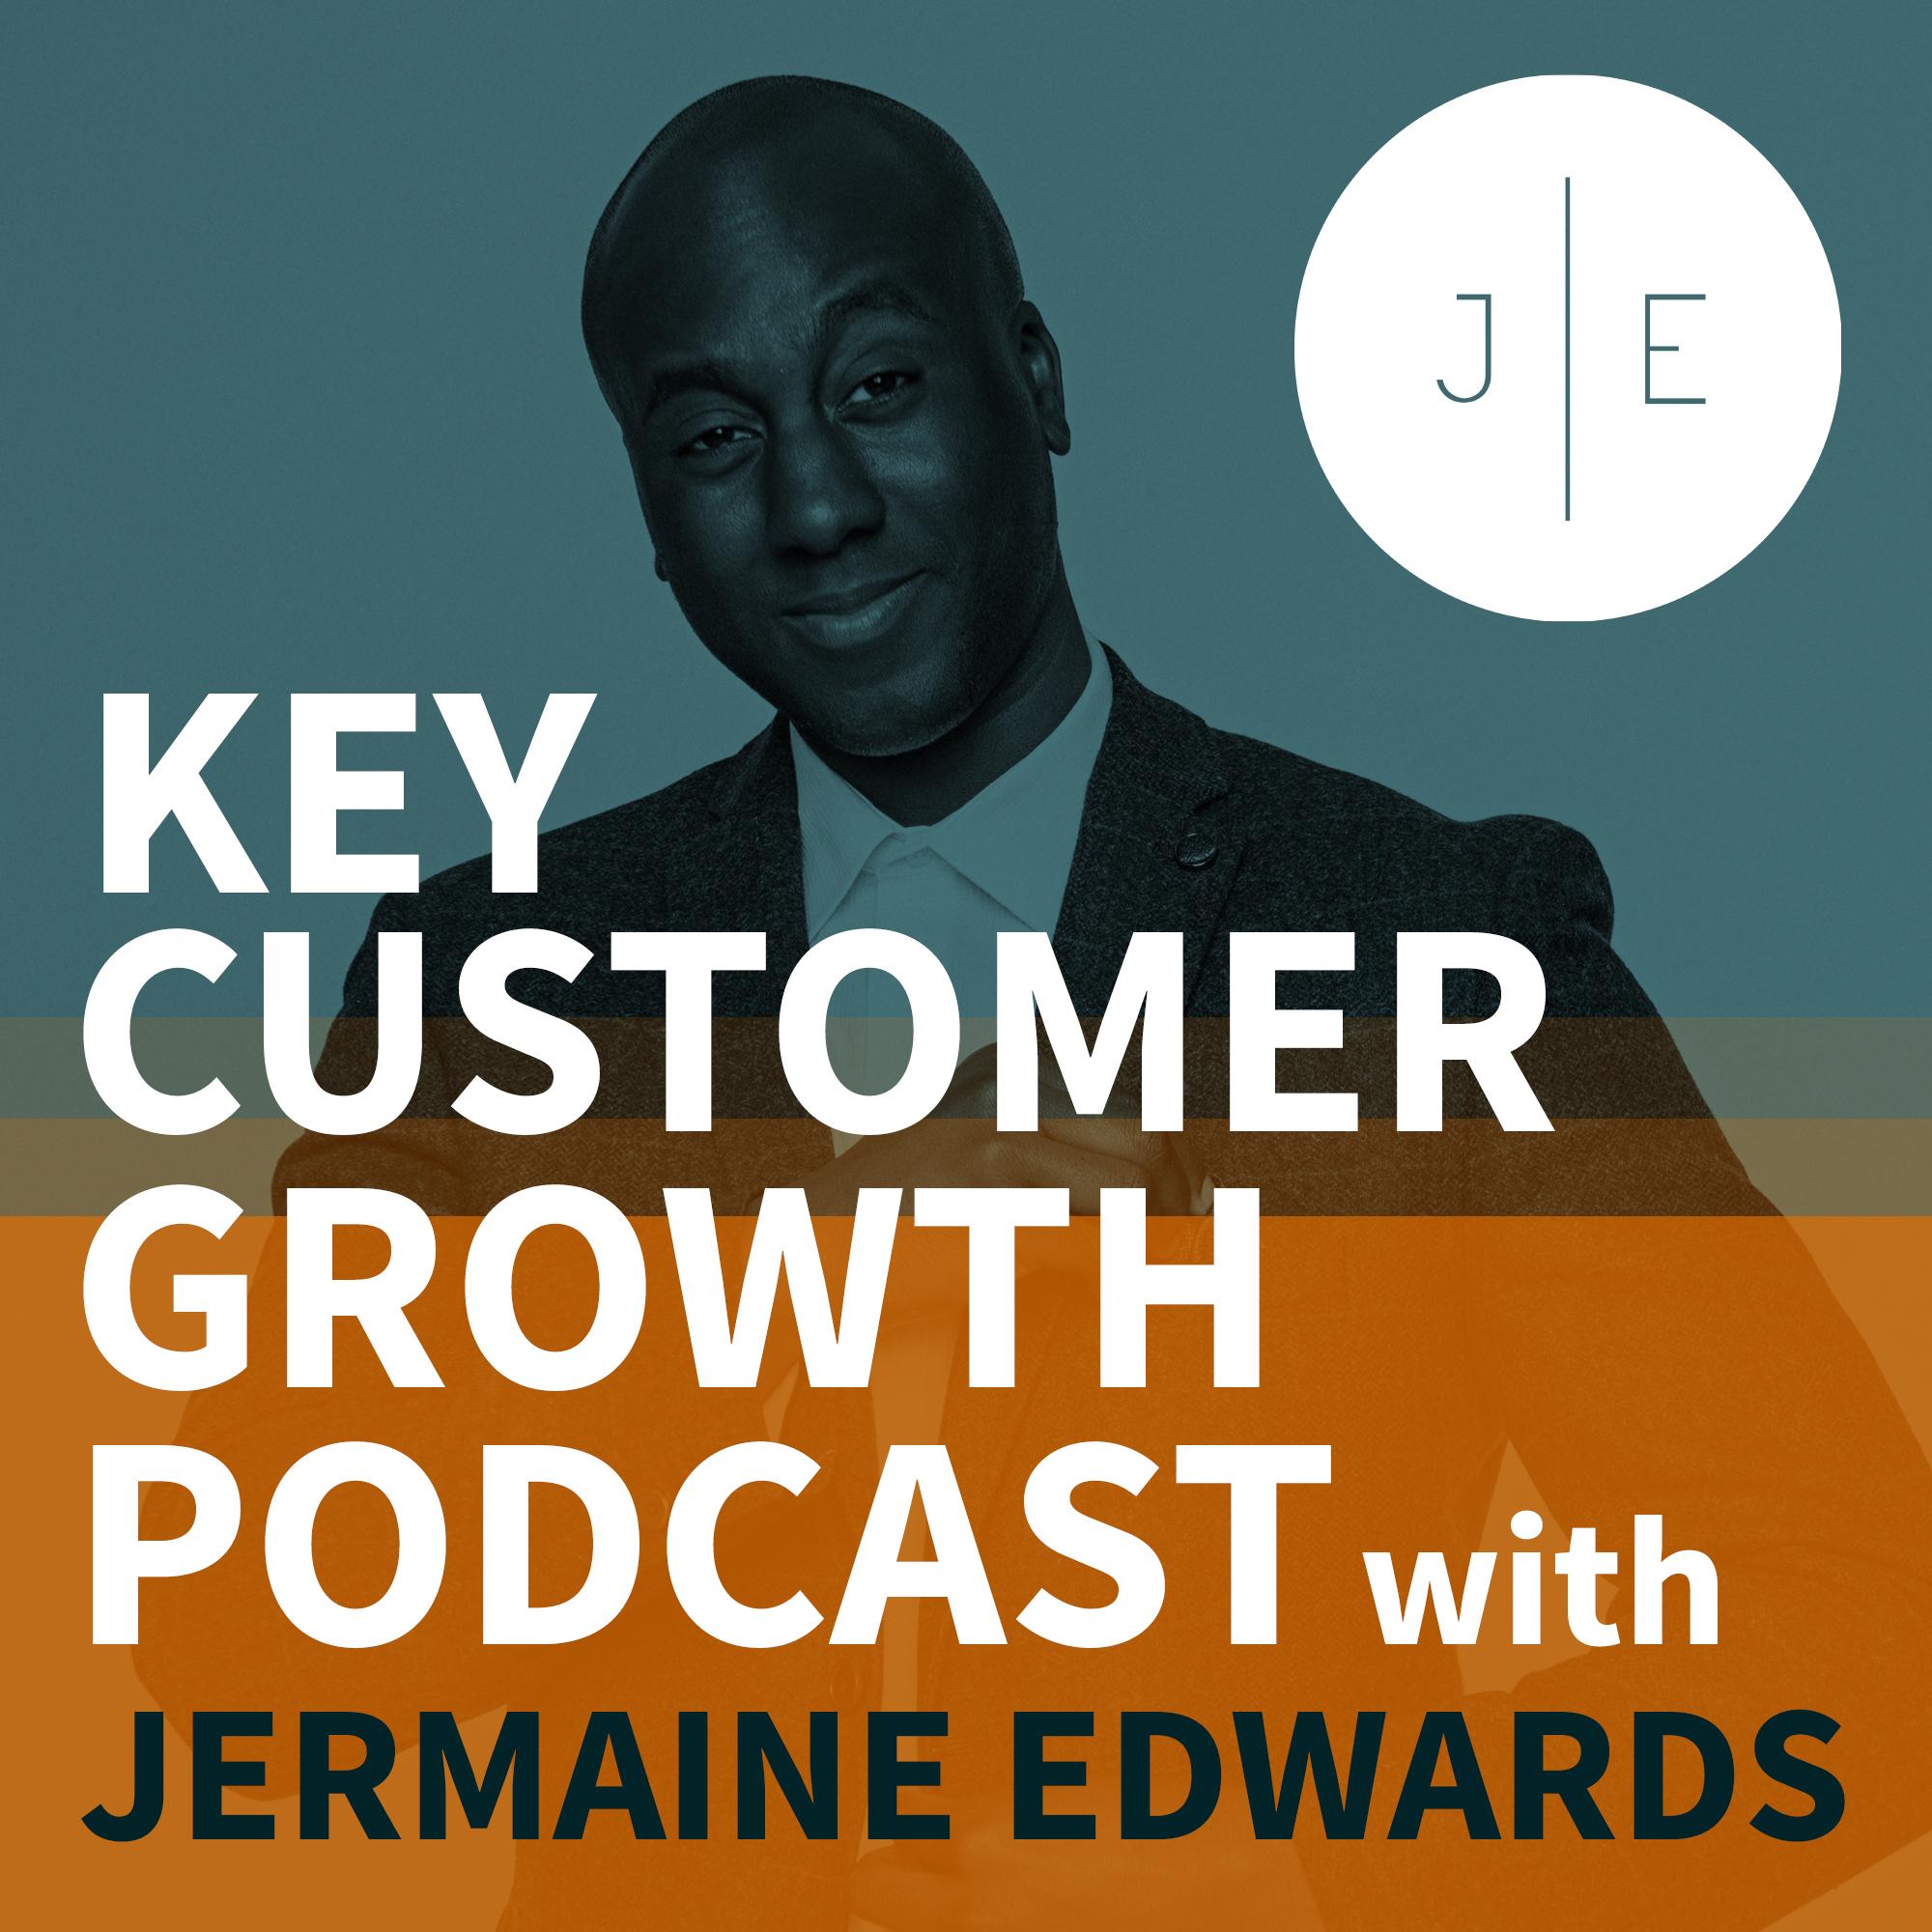 Key Customer Growth Podcast with Jermaine Edwards show art